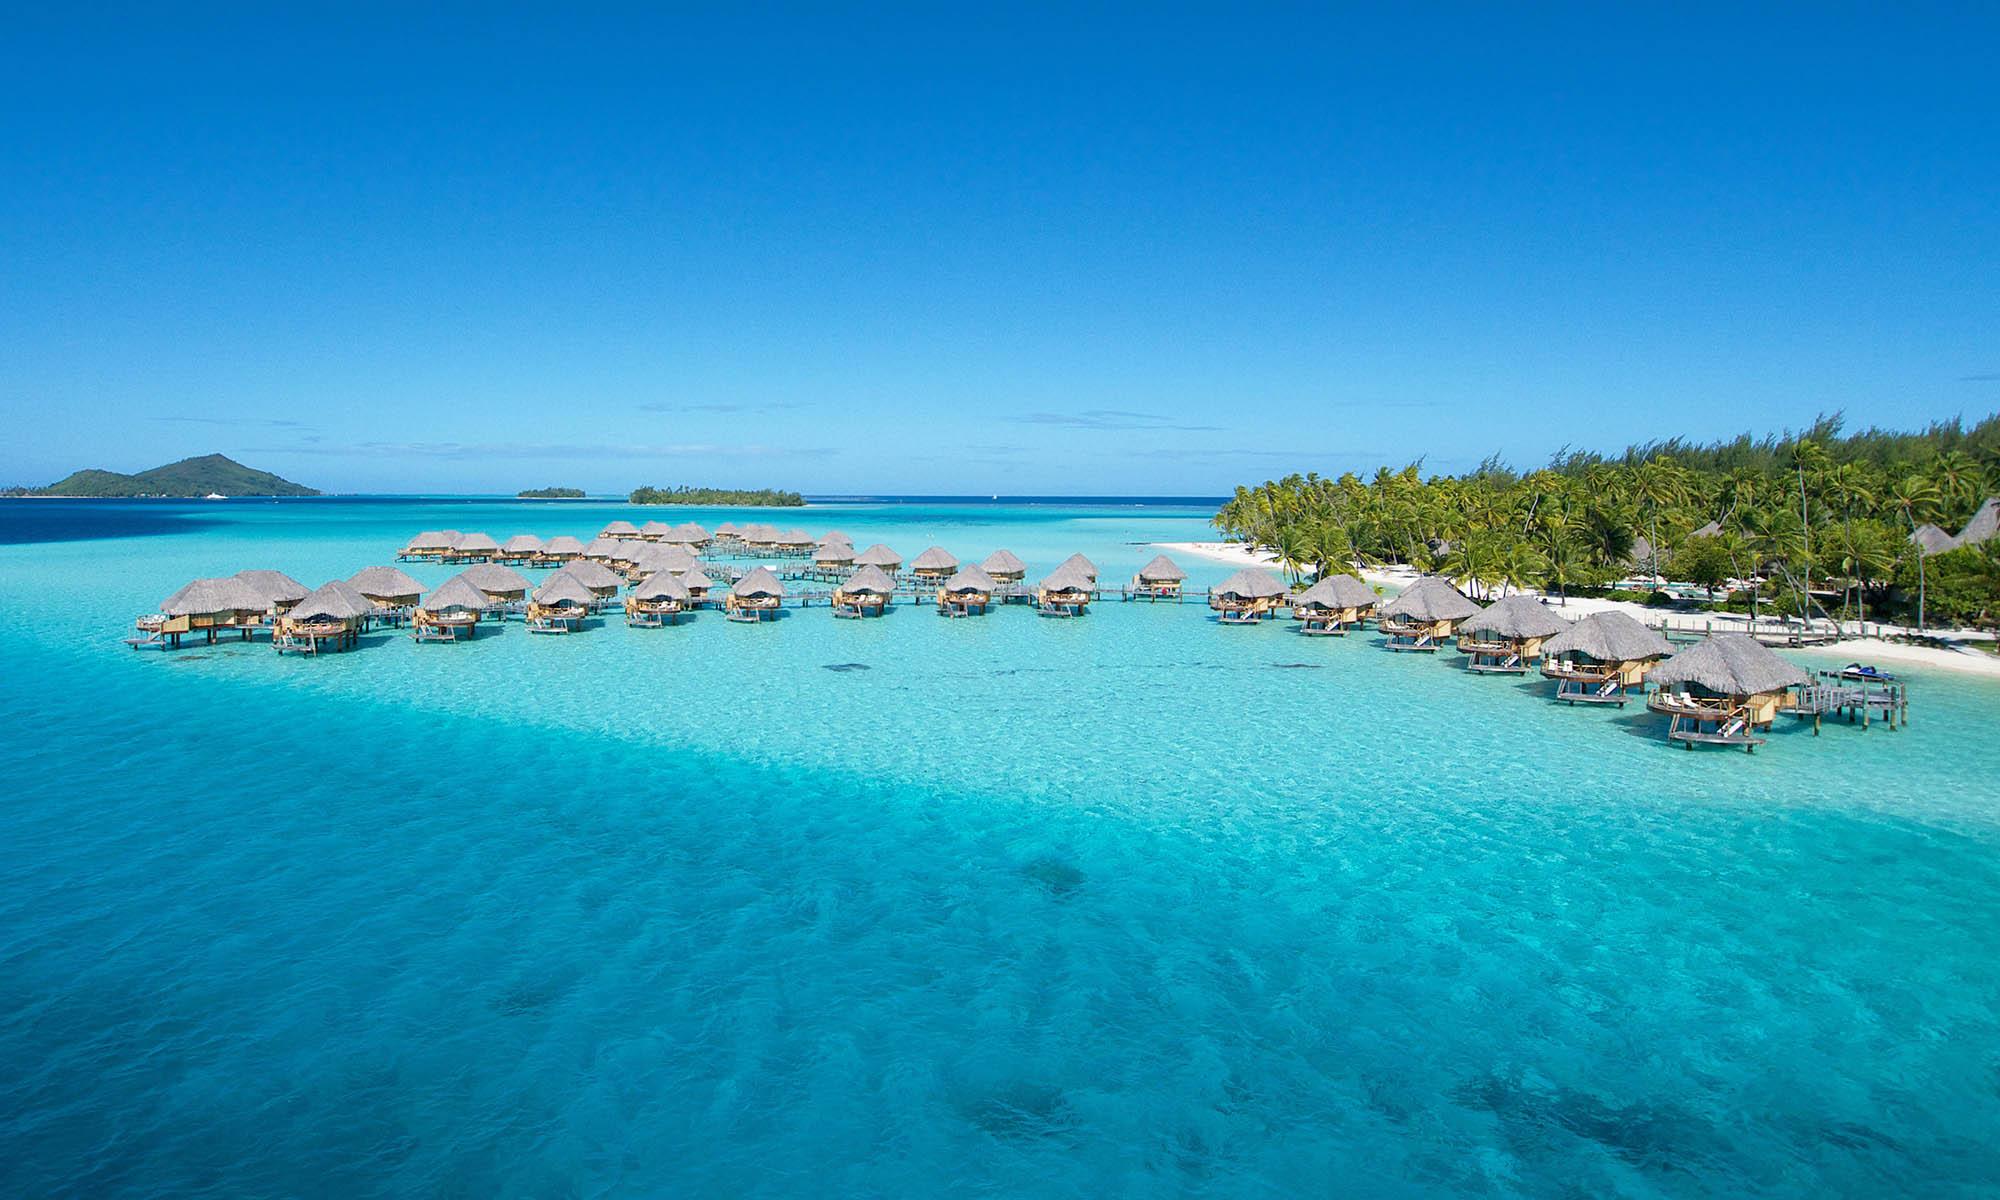 https://tahititourisme.com/wp-content/uploads/2020/08/Bora-Bora-Pearl-Beach-Resort-.jpg